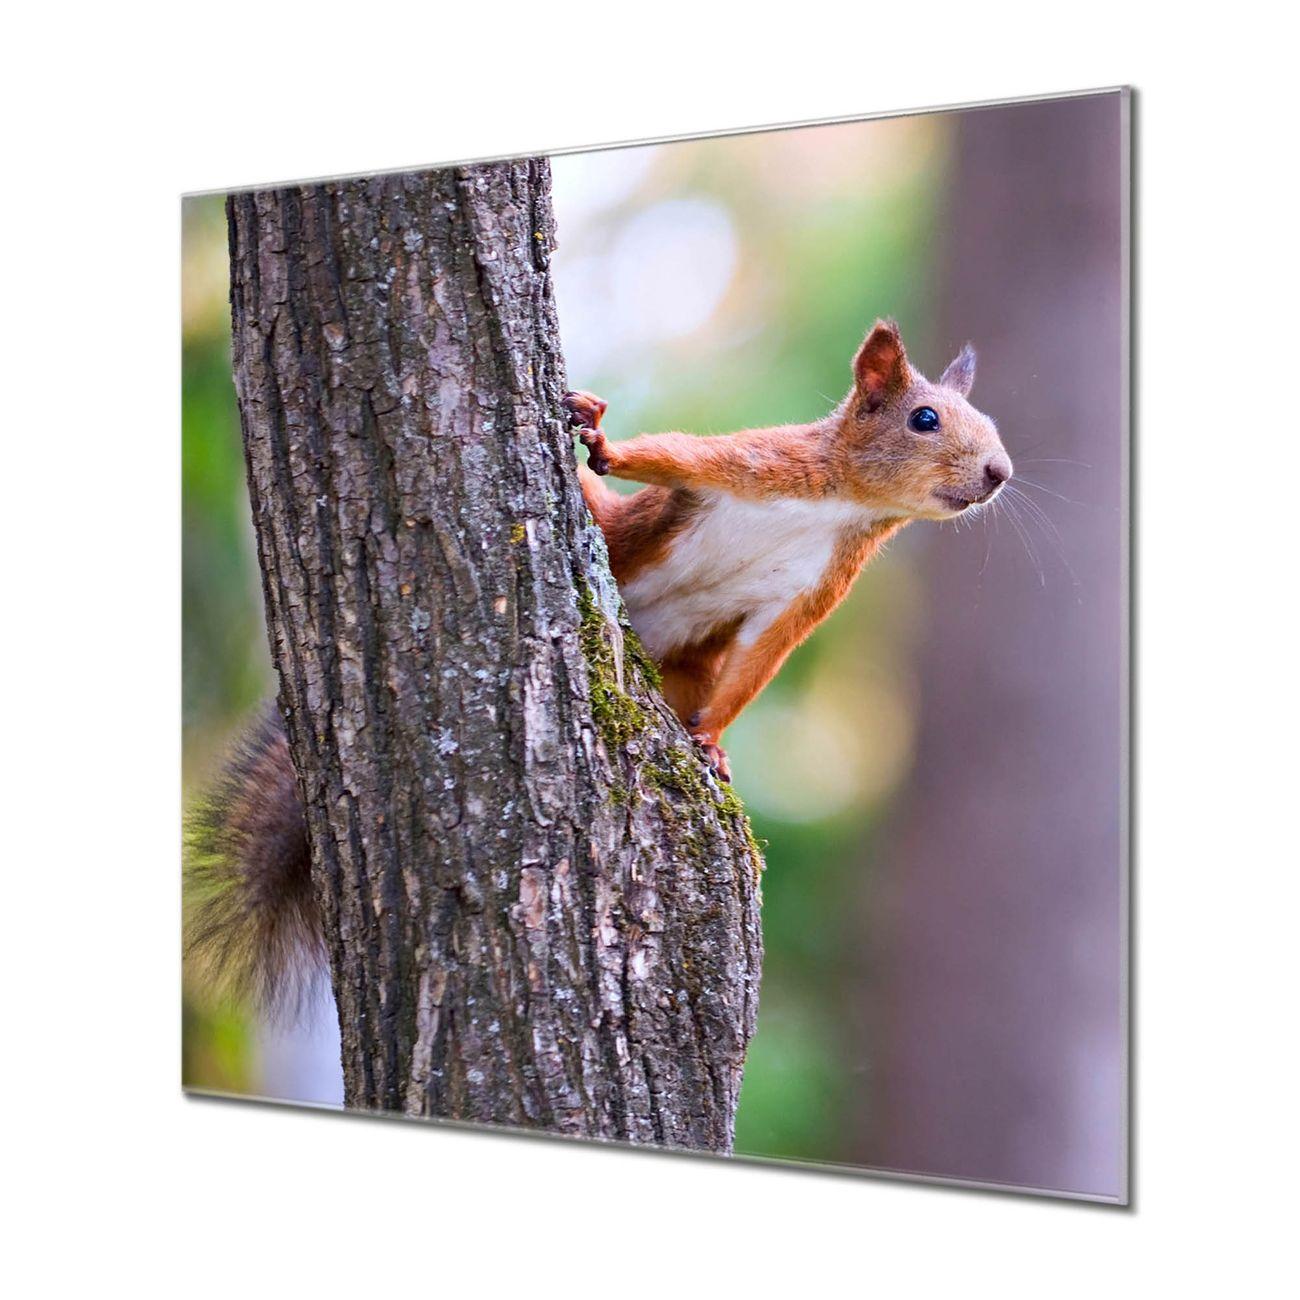 Küchenrückwand Glas Motiv Eichhörnchen